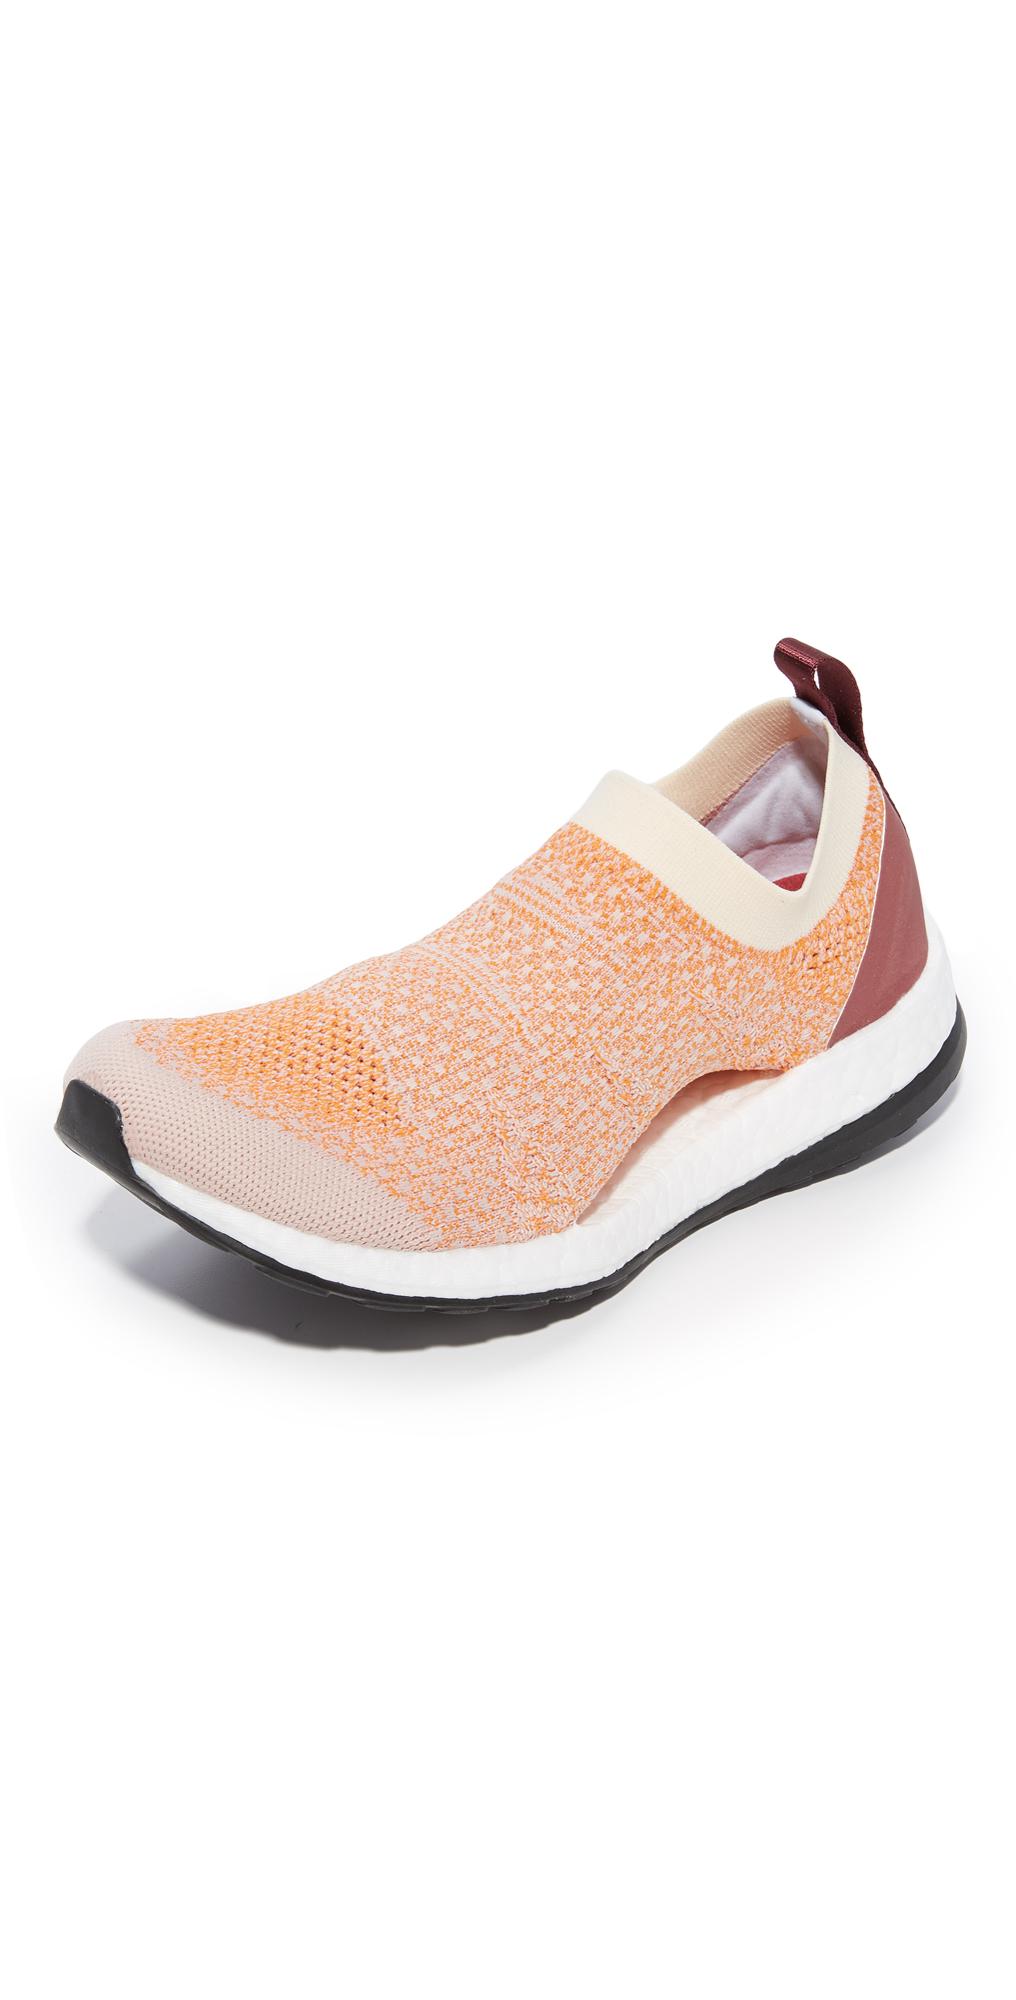 Pureboost X Sneakers adidas by Stella McCartney